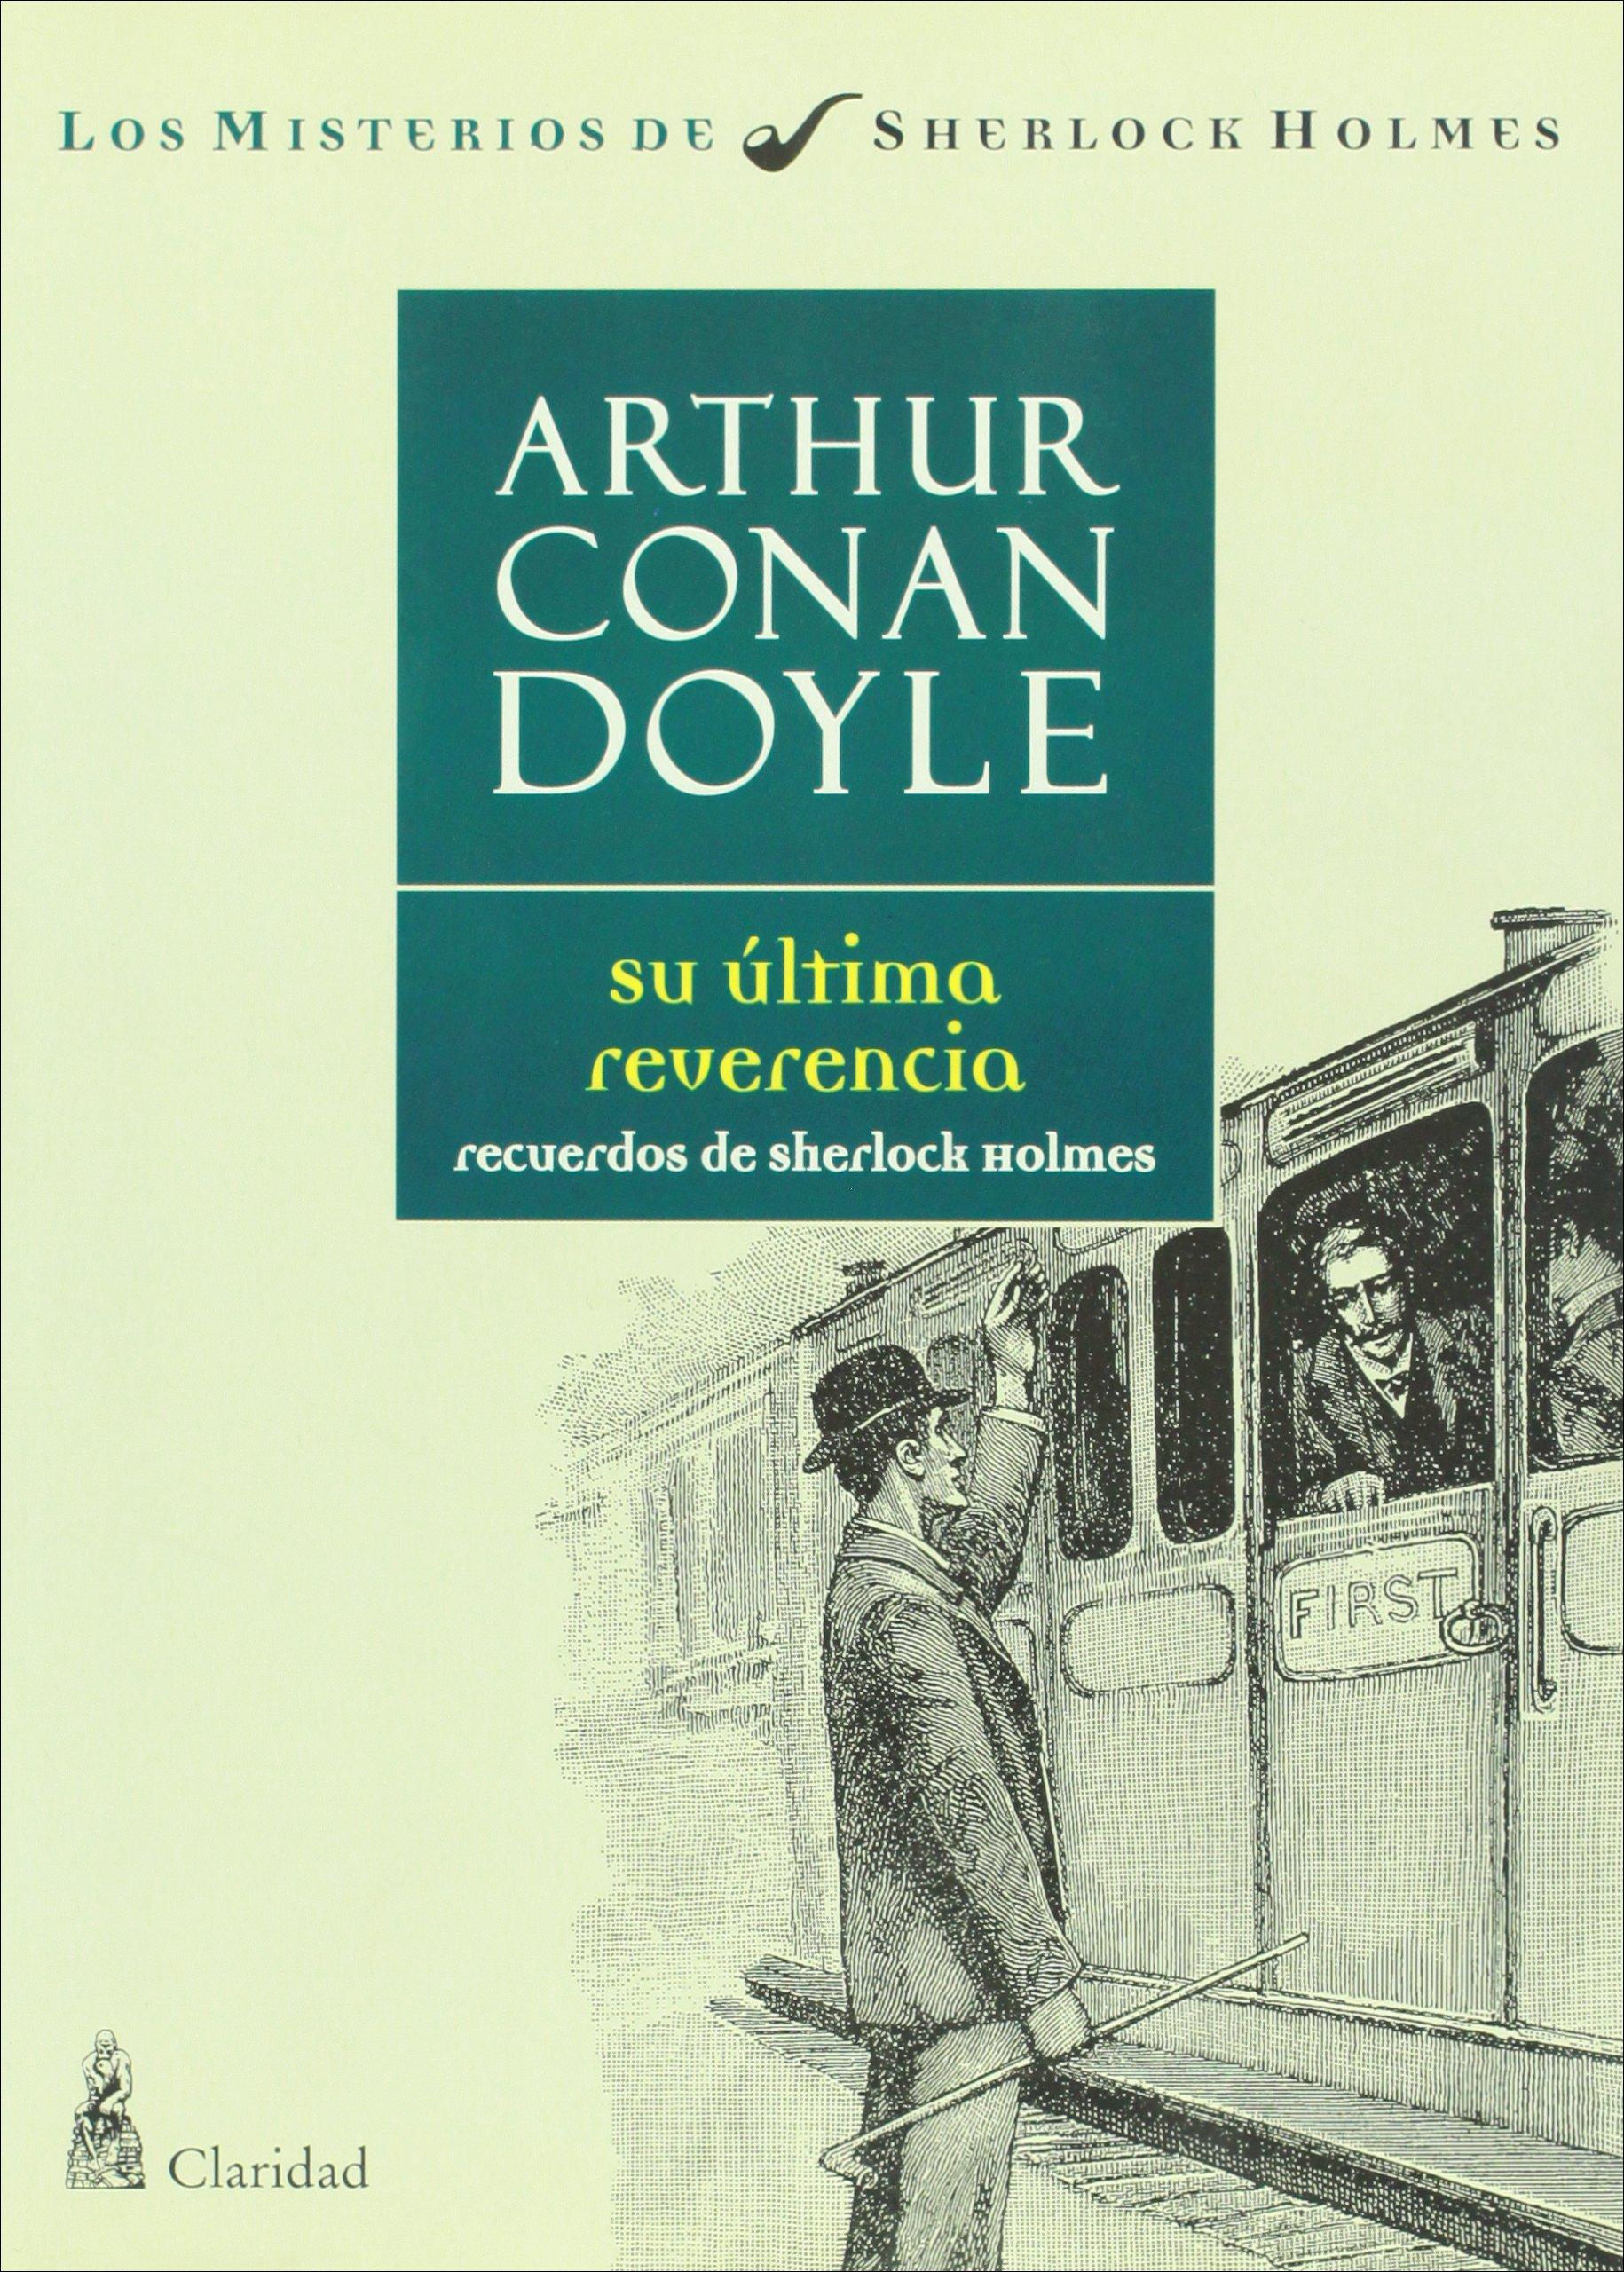 Su ultima reverencia. Recuerdos de Sherlock Holmes (Spanish Edition): Arthur Conan Doyle: 9789506201678: Amazon.com: Books